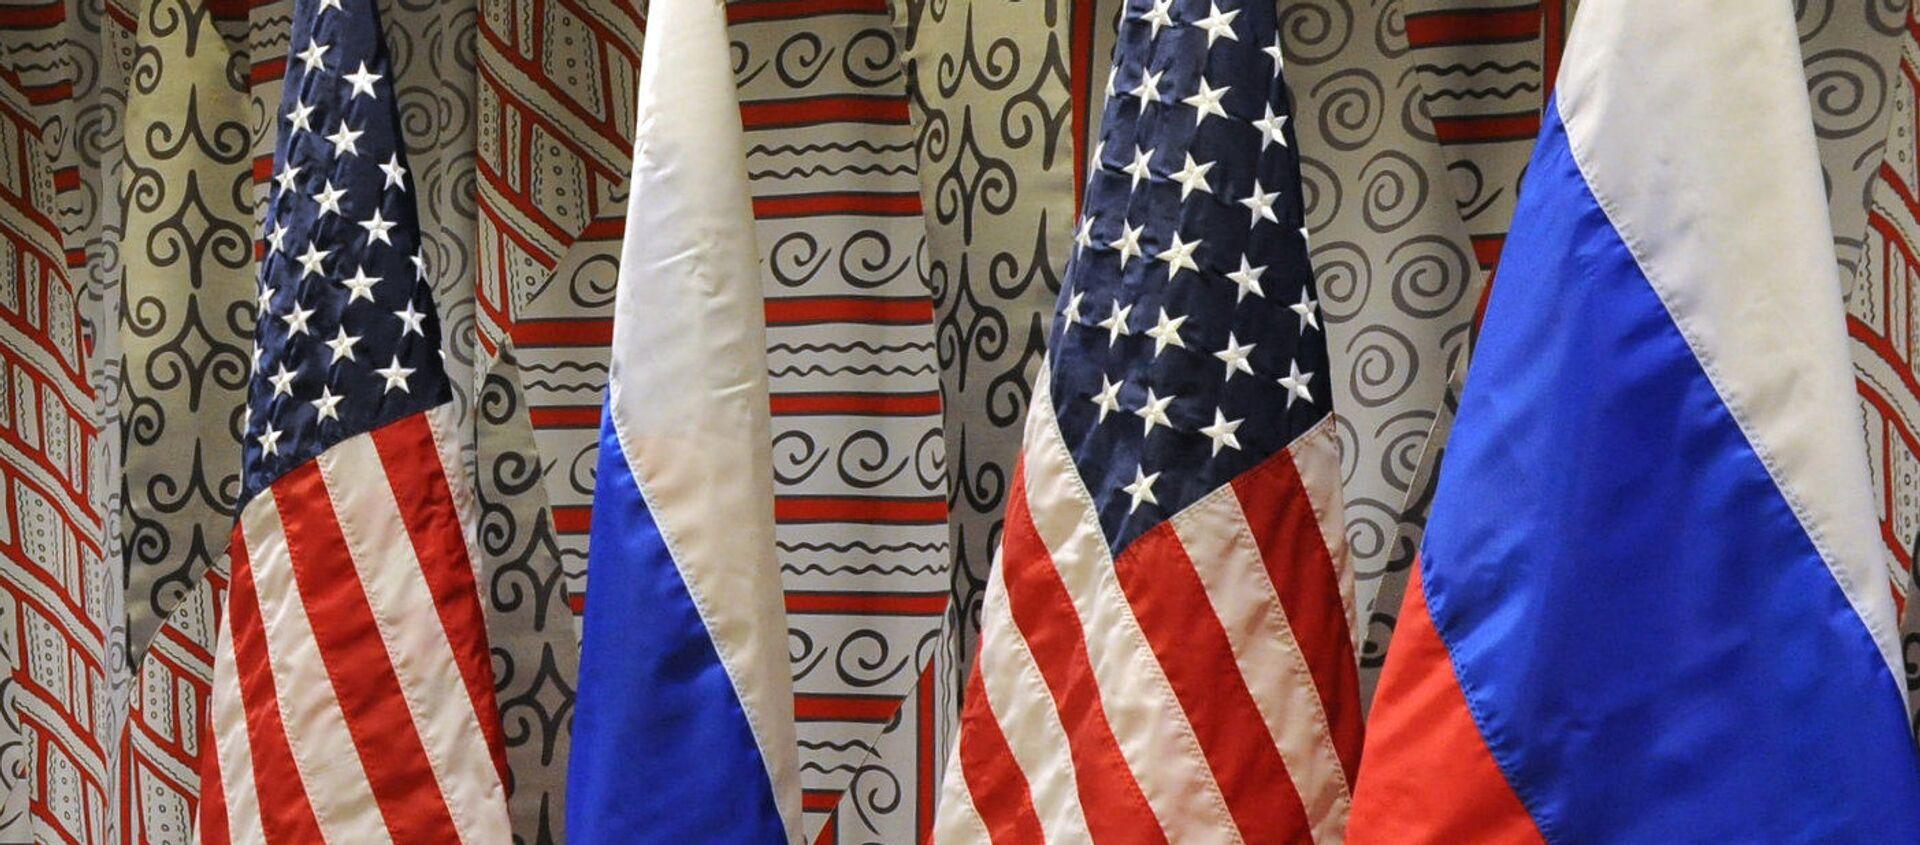 Флаги России и США - Sputnik Азербайджан, 1920, 01.04.2021